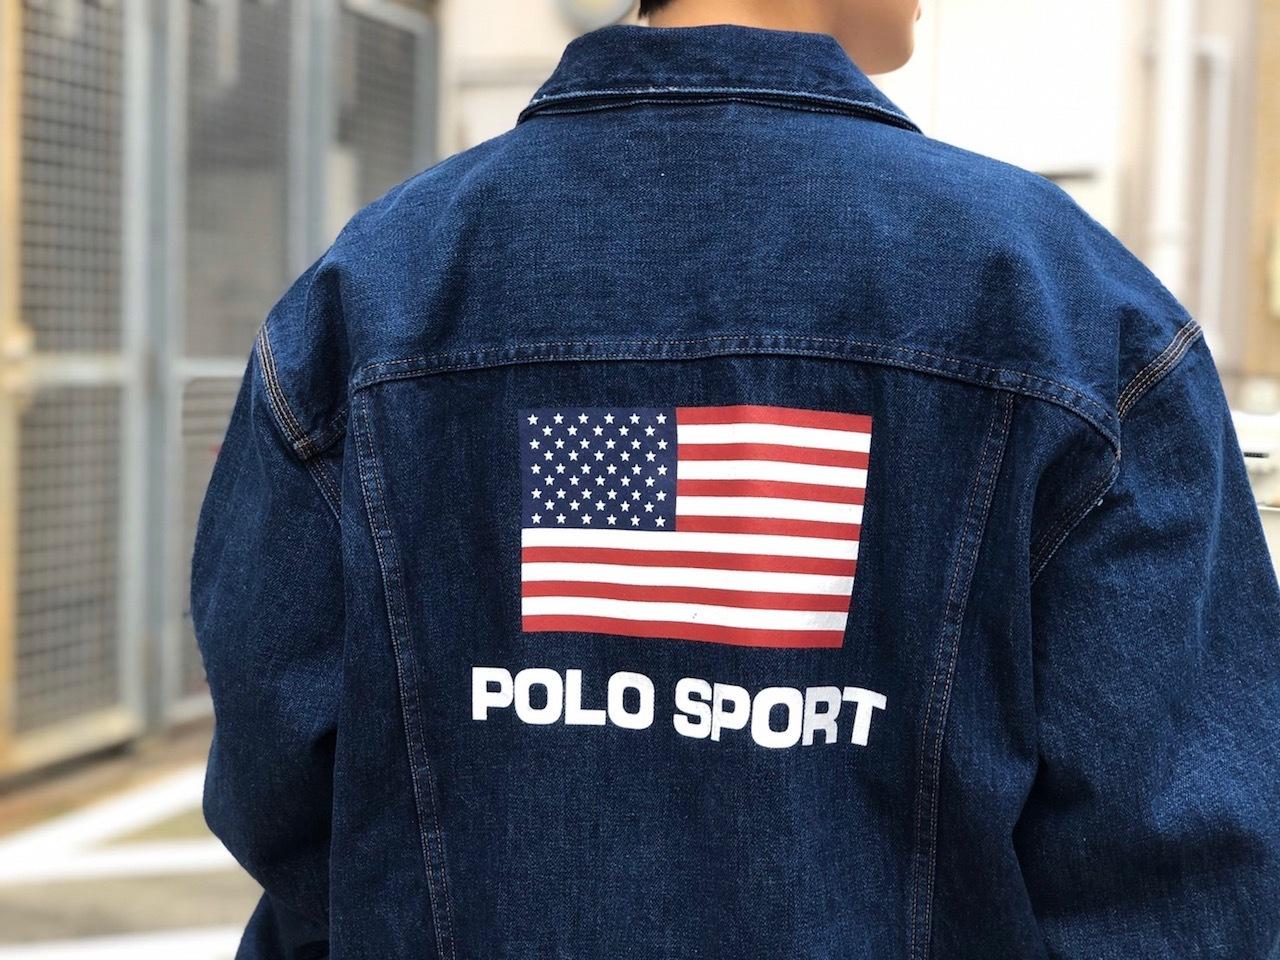 POLO SPORT US FLAG DENIM JACKET!!!_a0221253_21595916.jpg